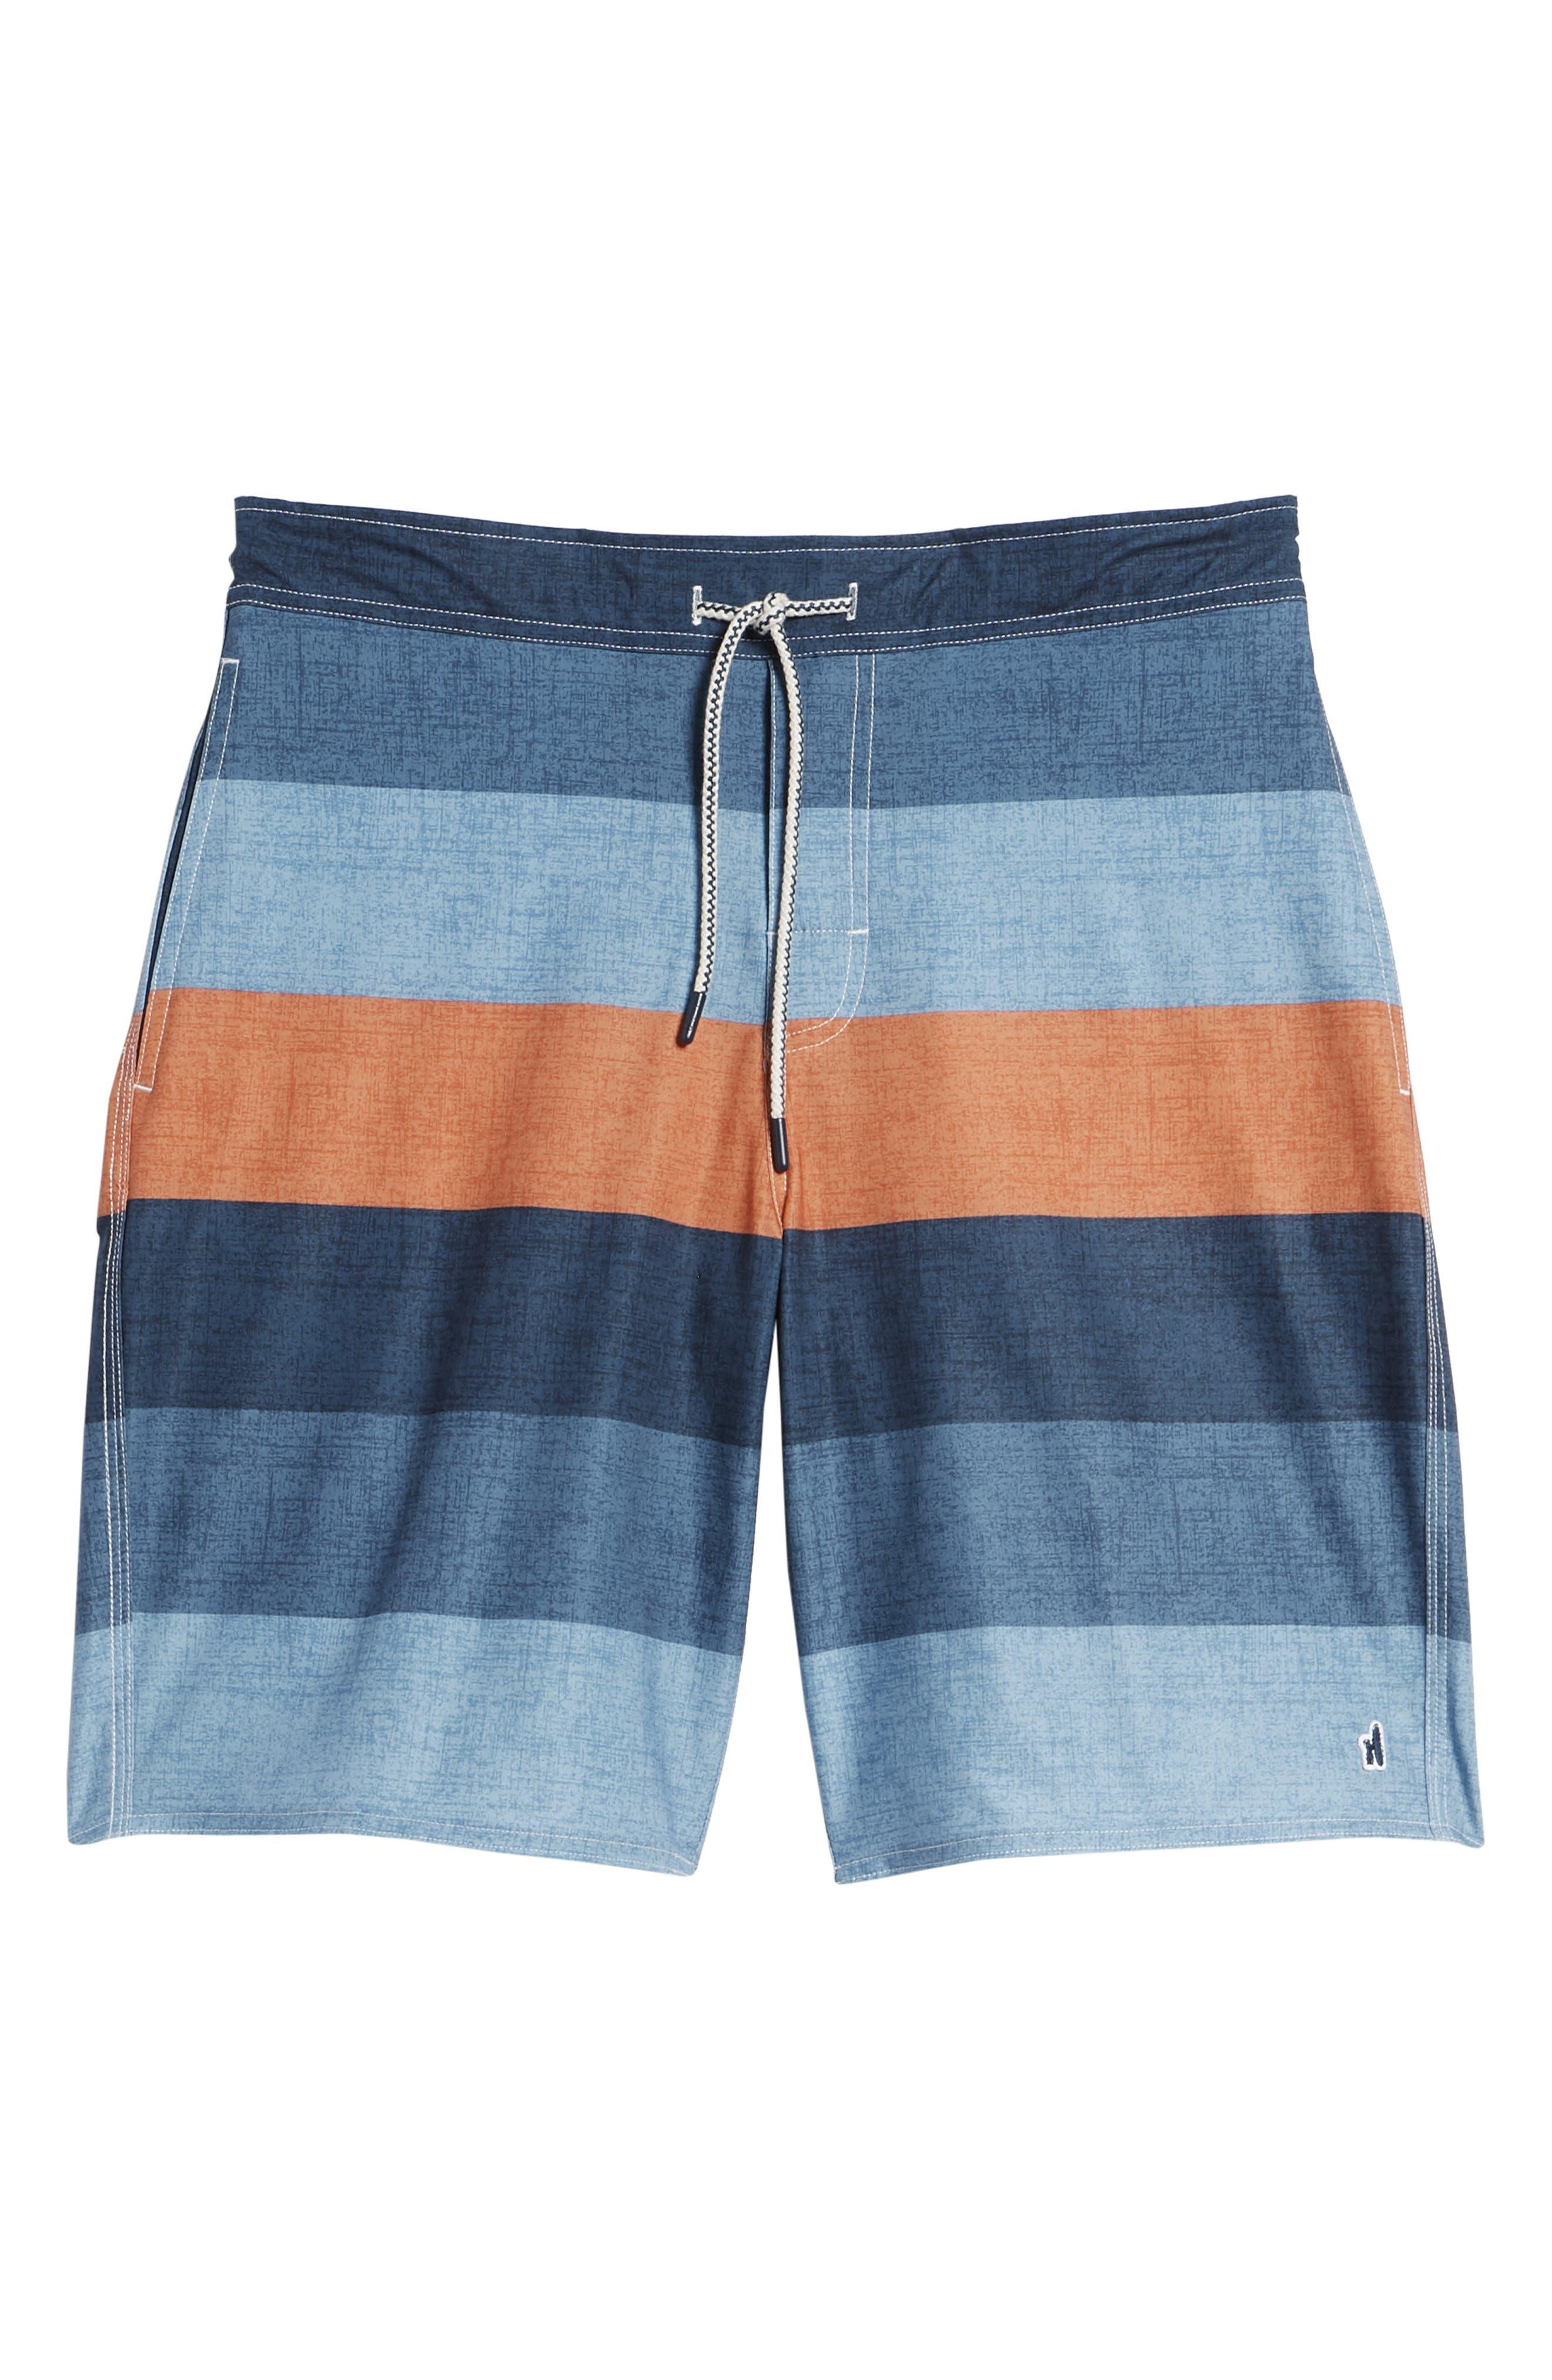 Shore Swim Trunks,                             Alternate thumbnail 6, color,                             400